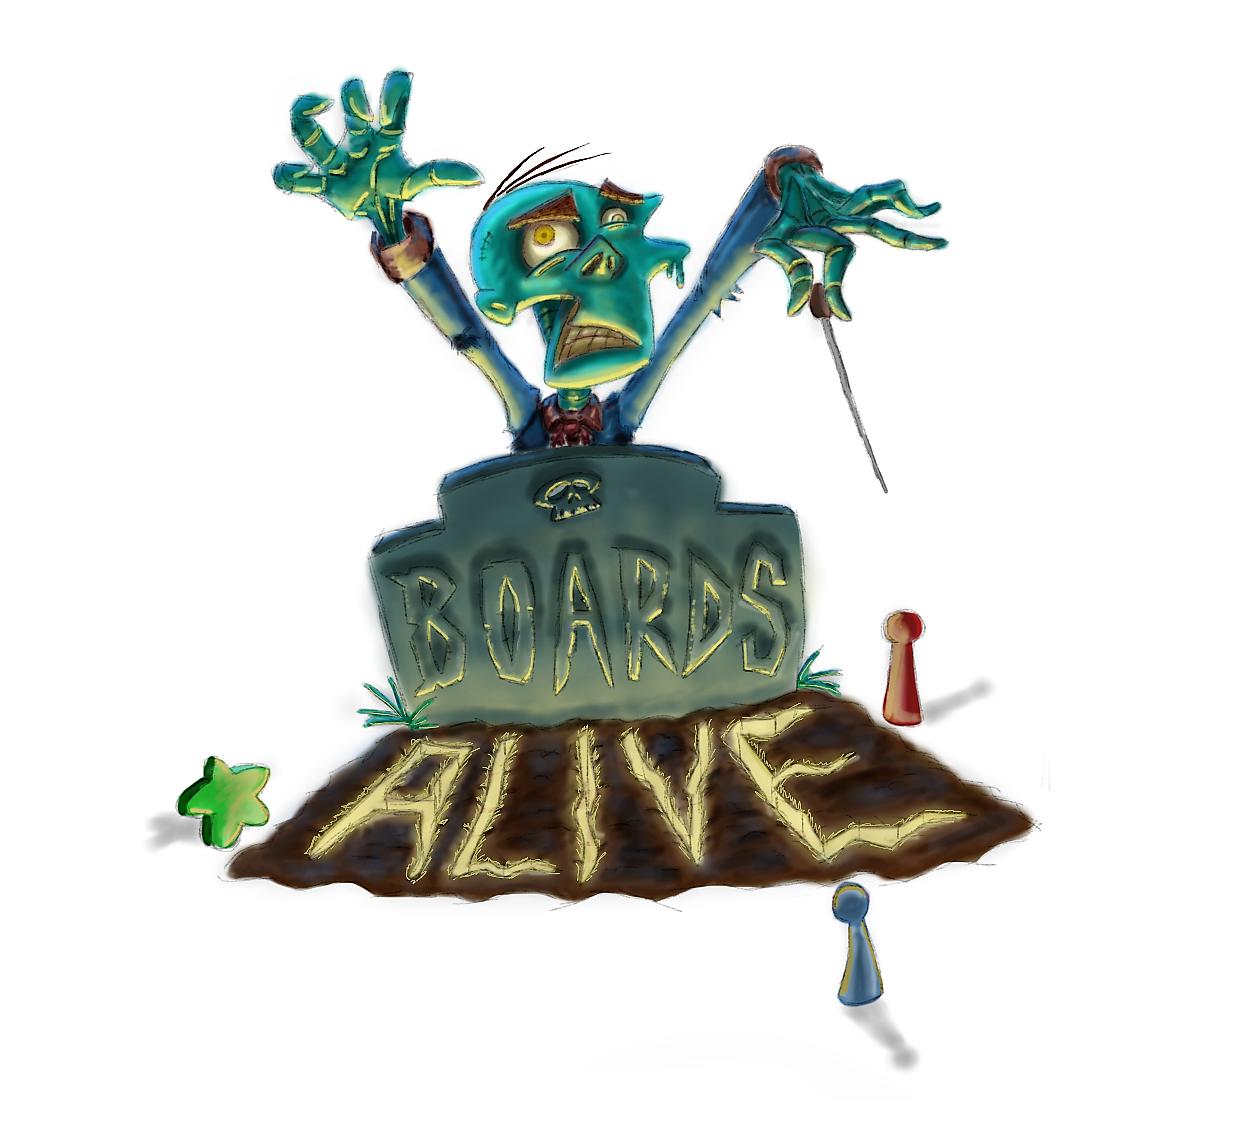 Boards Alive - PodcastRating: PG-13